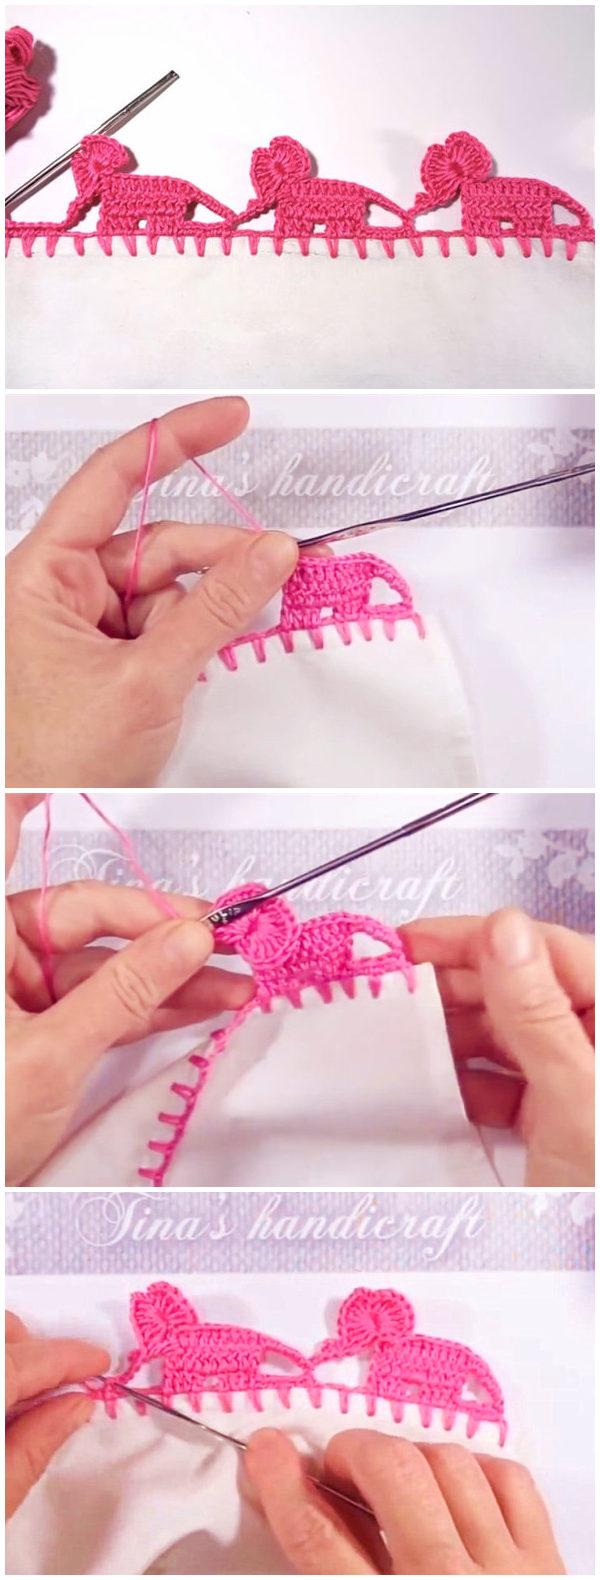 Crochet Elephant Edging